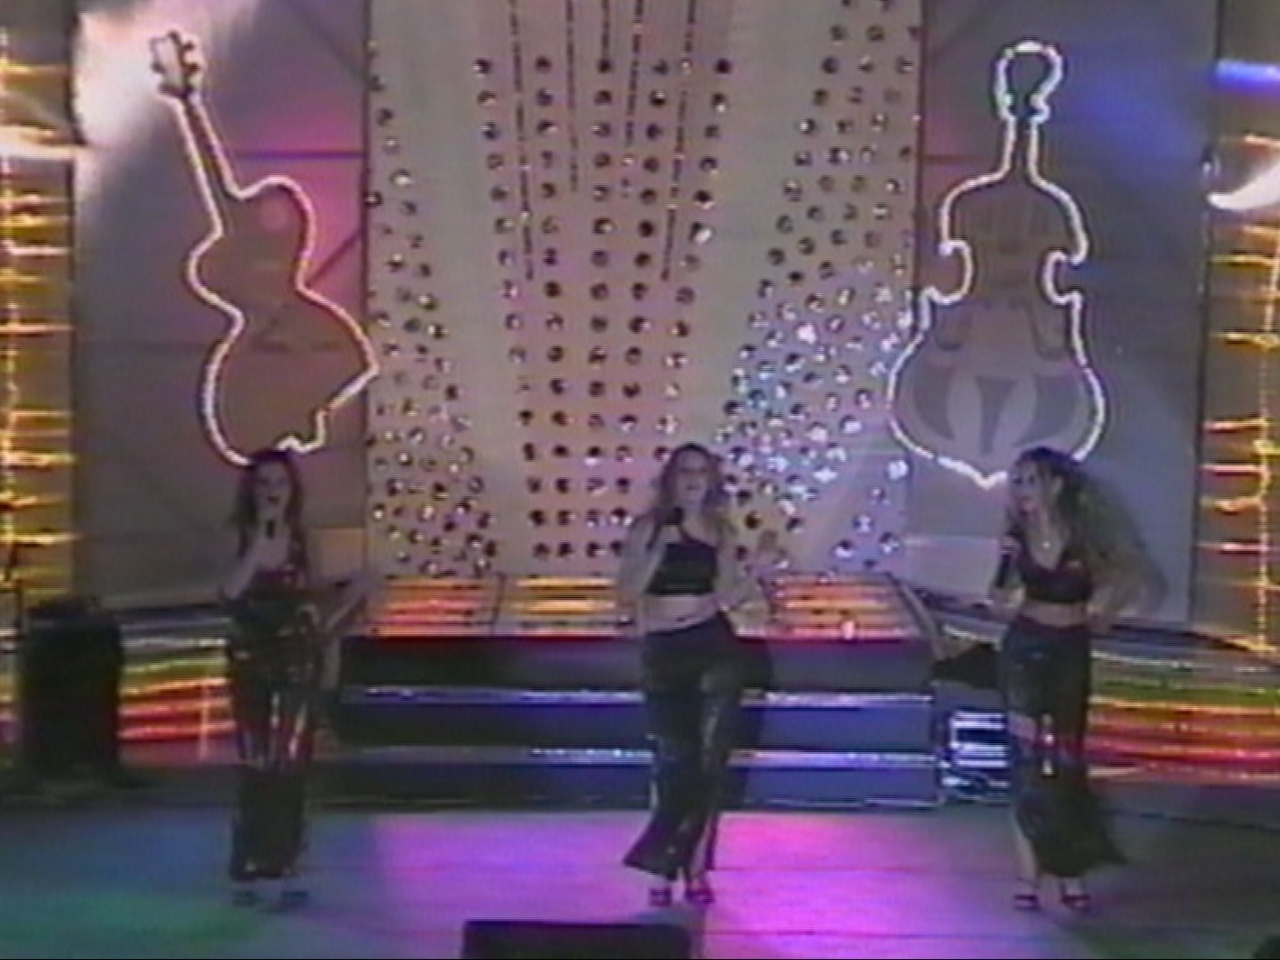 Amara 2001 - Trofeul - Grupul Vox.jpg